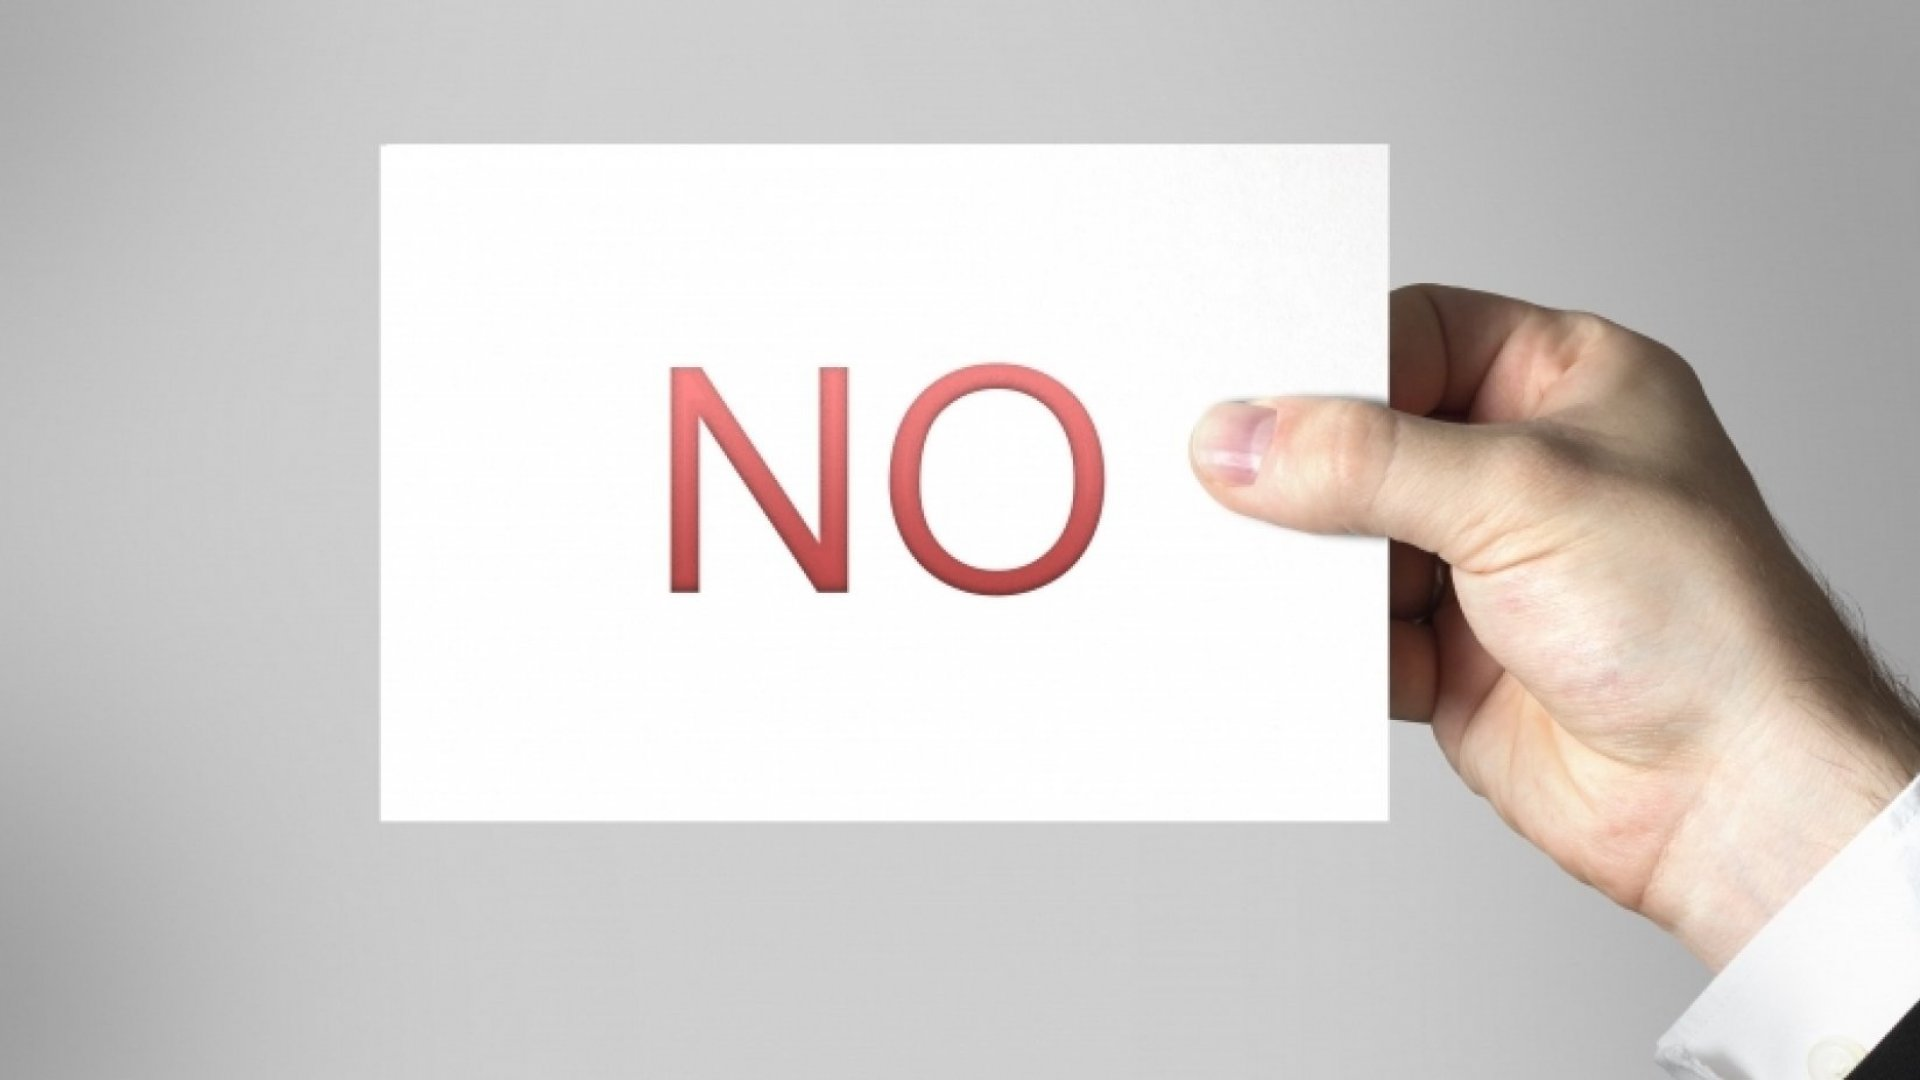 No ۶ توصیه که به پیشرفت شما در مسیر شغلی کمک میکند اخبار IT